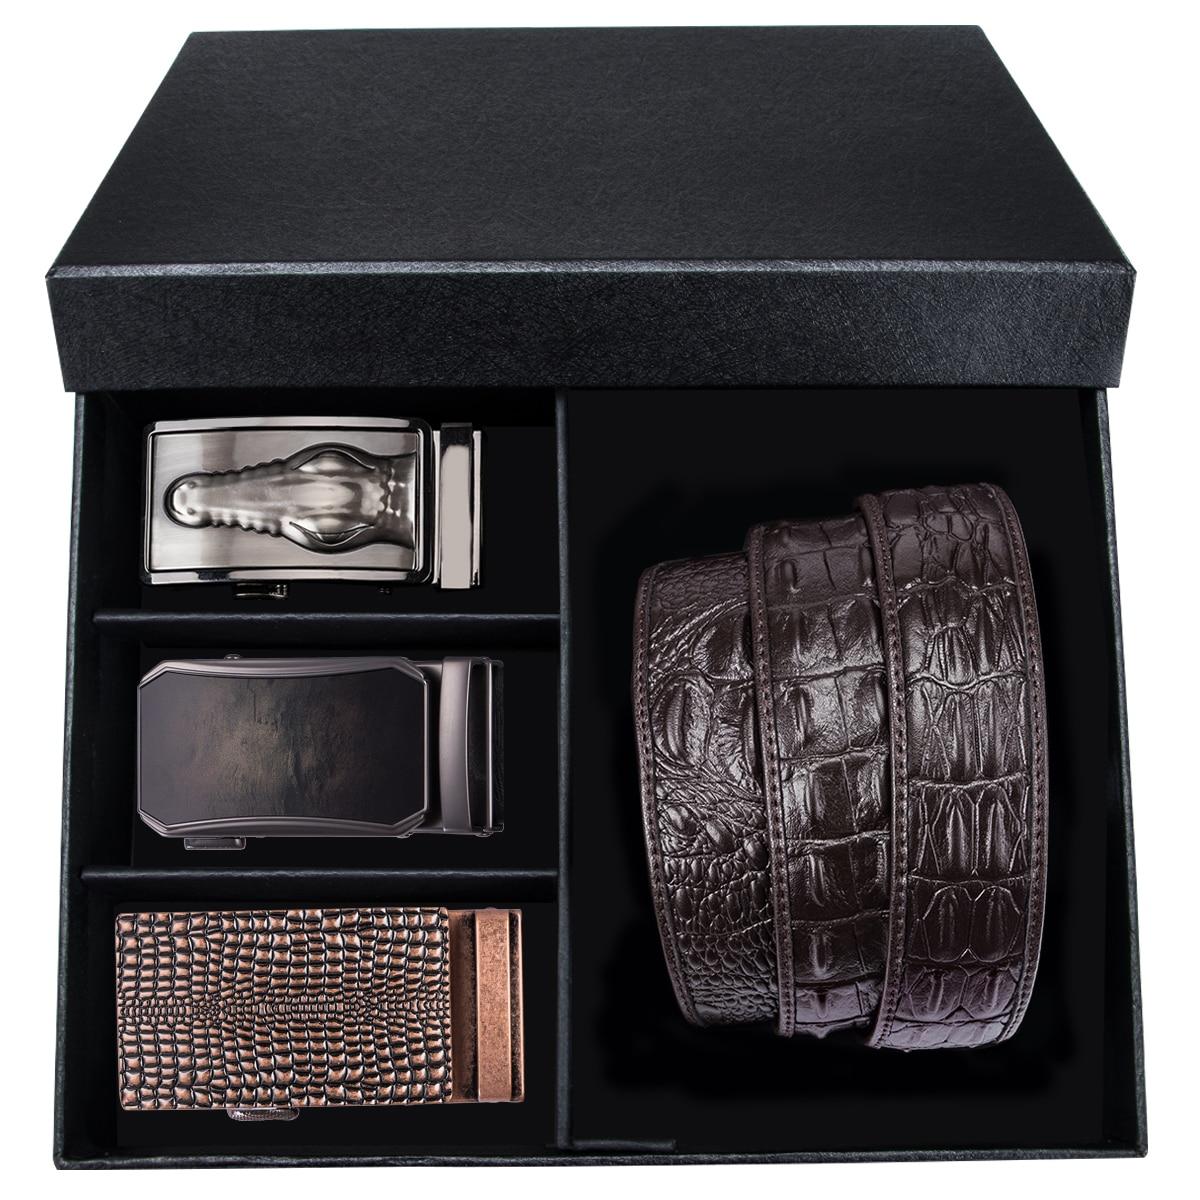 Hi-Tie Luxury Box Belt Mens Brown Cowhide Genuine Leather Automatic Buckle Belts For Men Cowboy Crocodile Jeans Belt Strap